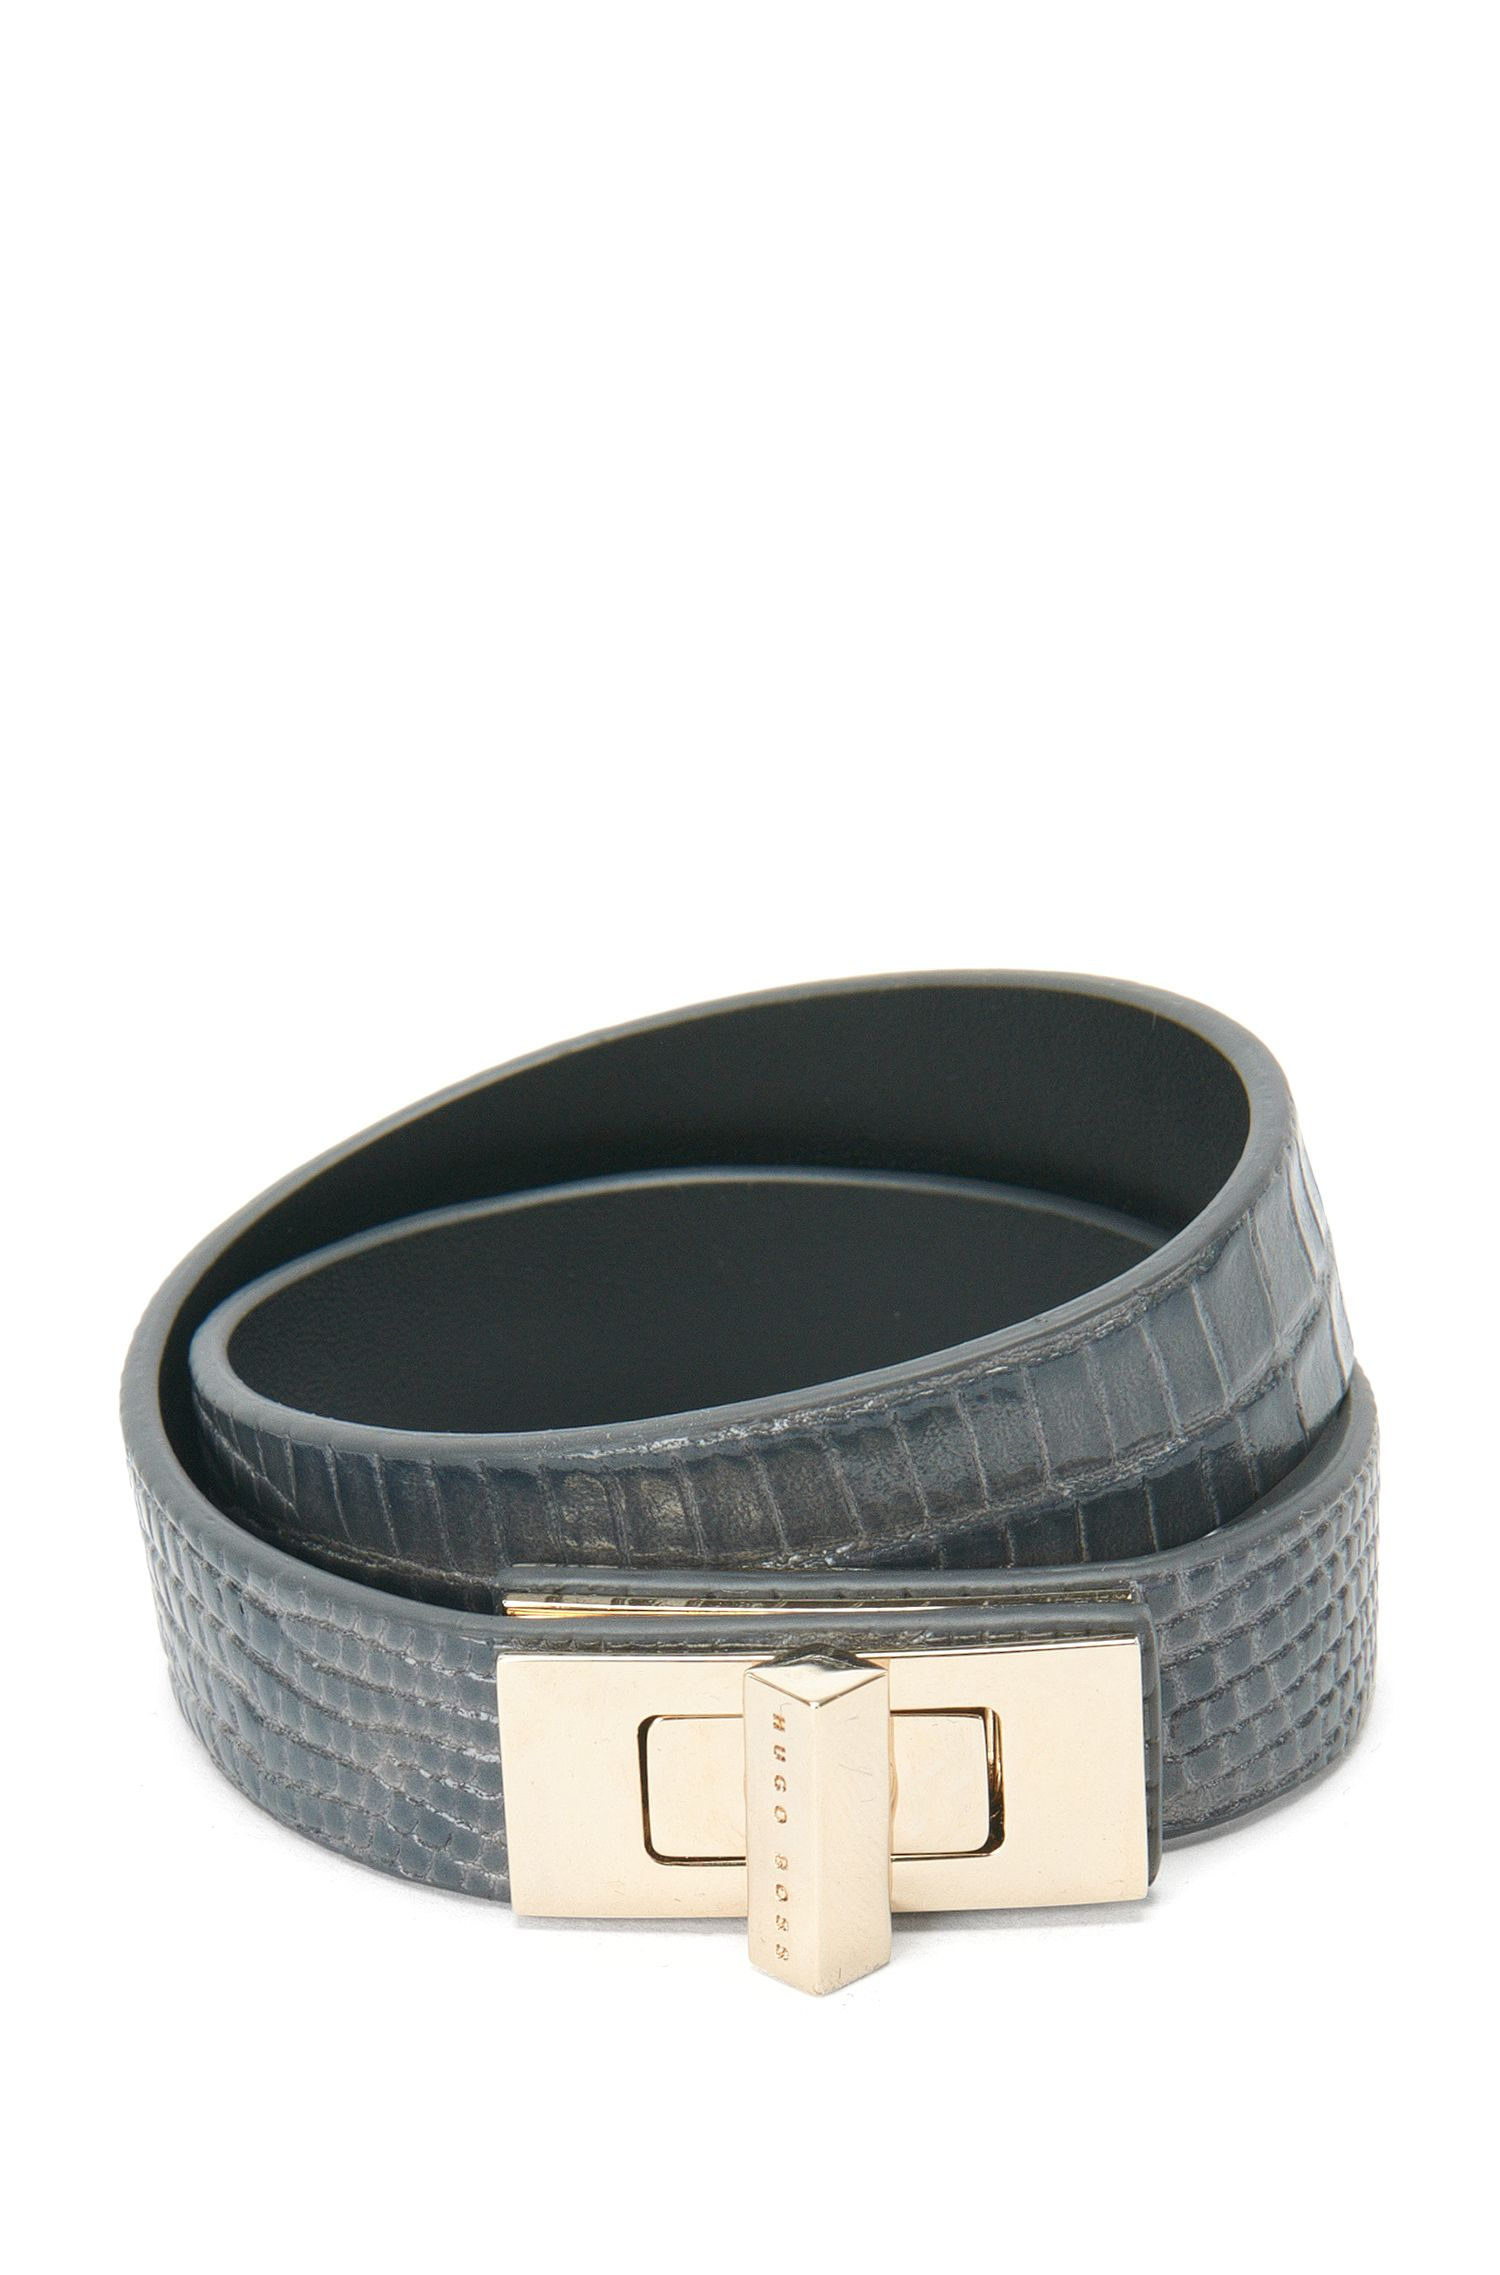 BOSS Bespoke Armband aus Leder mit Reptilien-Print